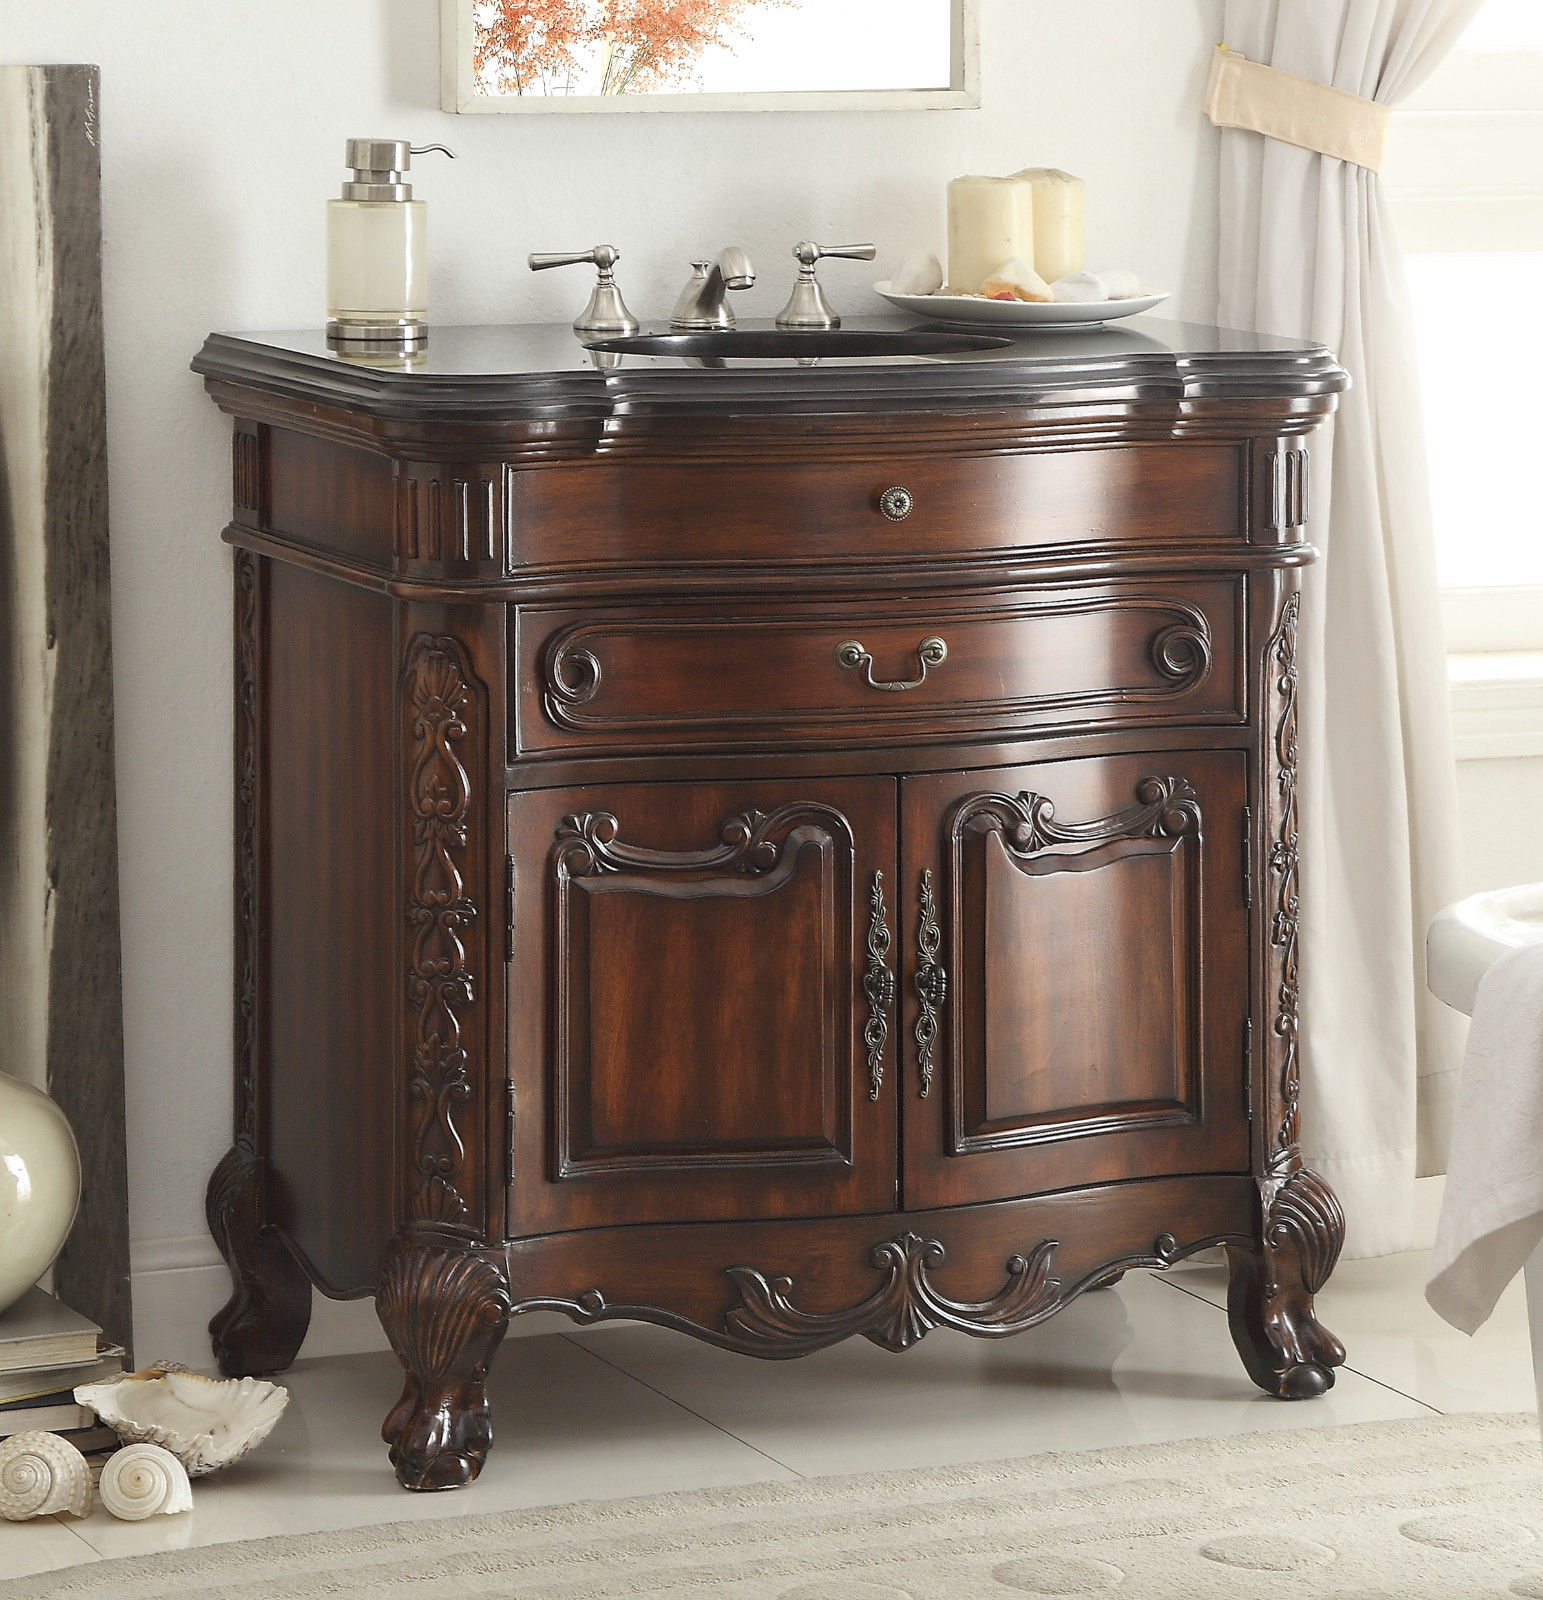 Adelina 36 inch antique mahogany bathroom sink vanity - Antique looking bathroom vanities ...